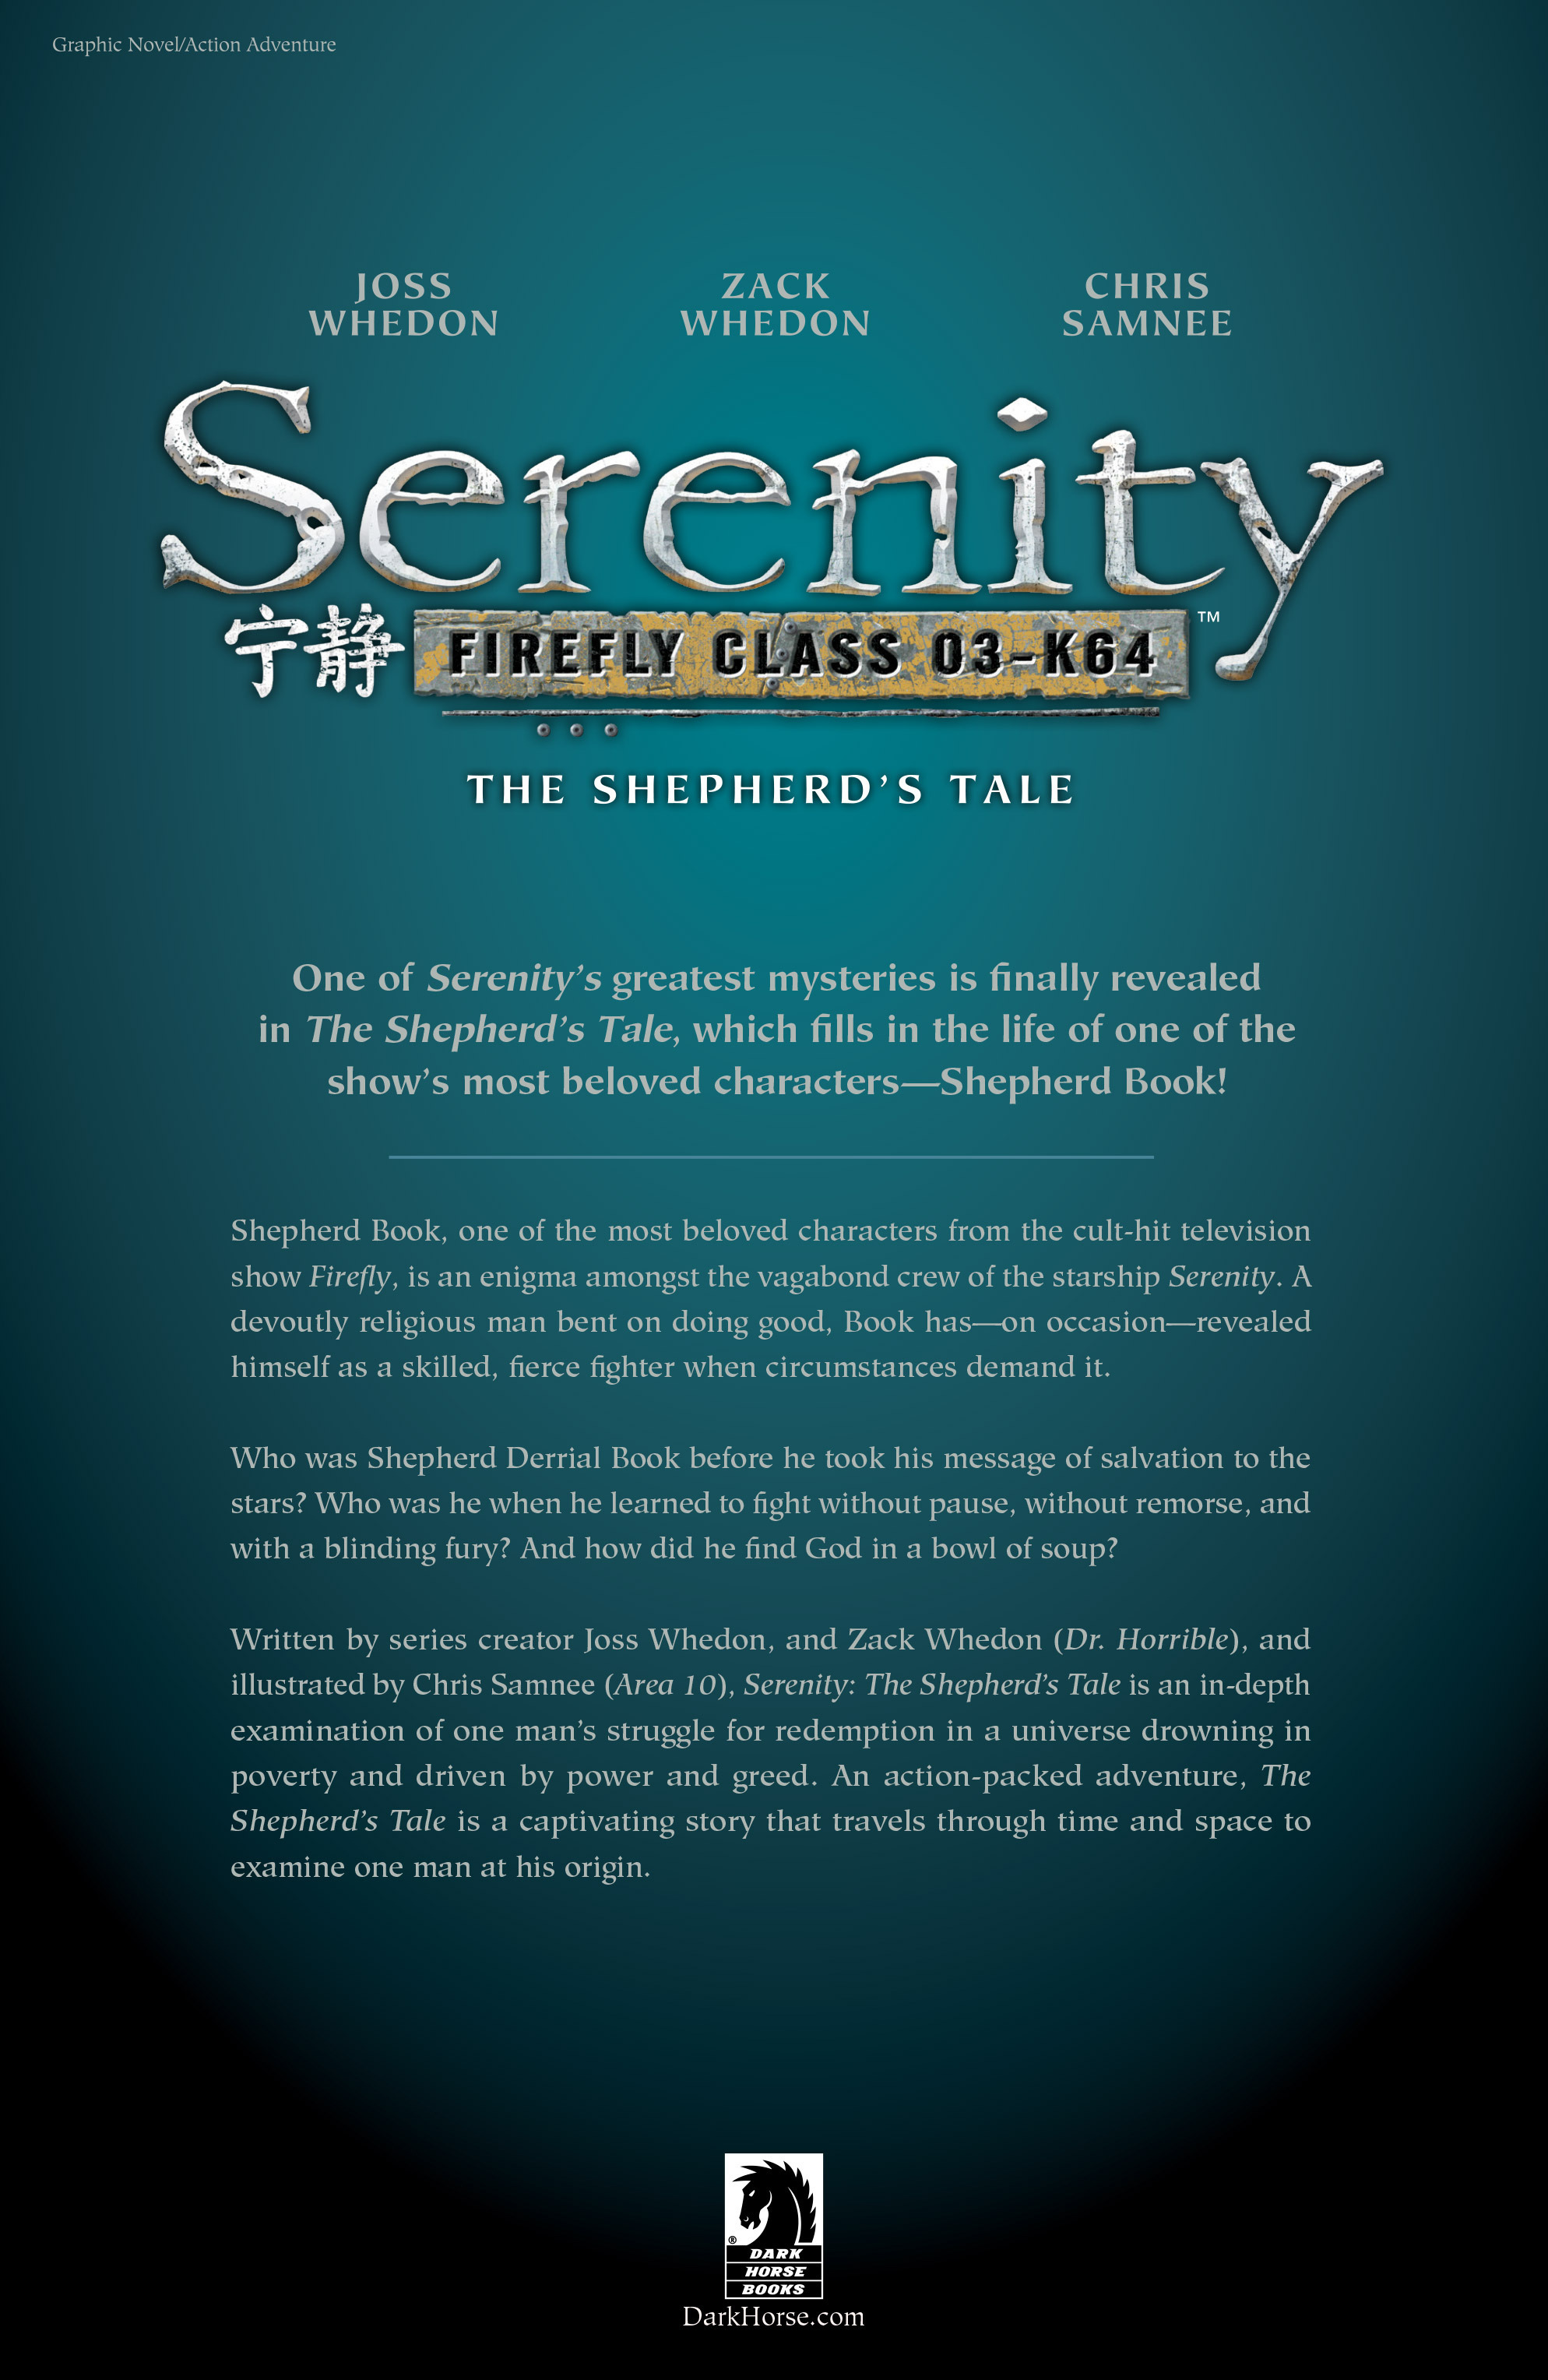 Read online Serenity Volume Three: The Shepherd's Tale comic -  Issue # TPB - 58